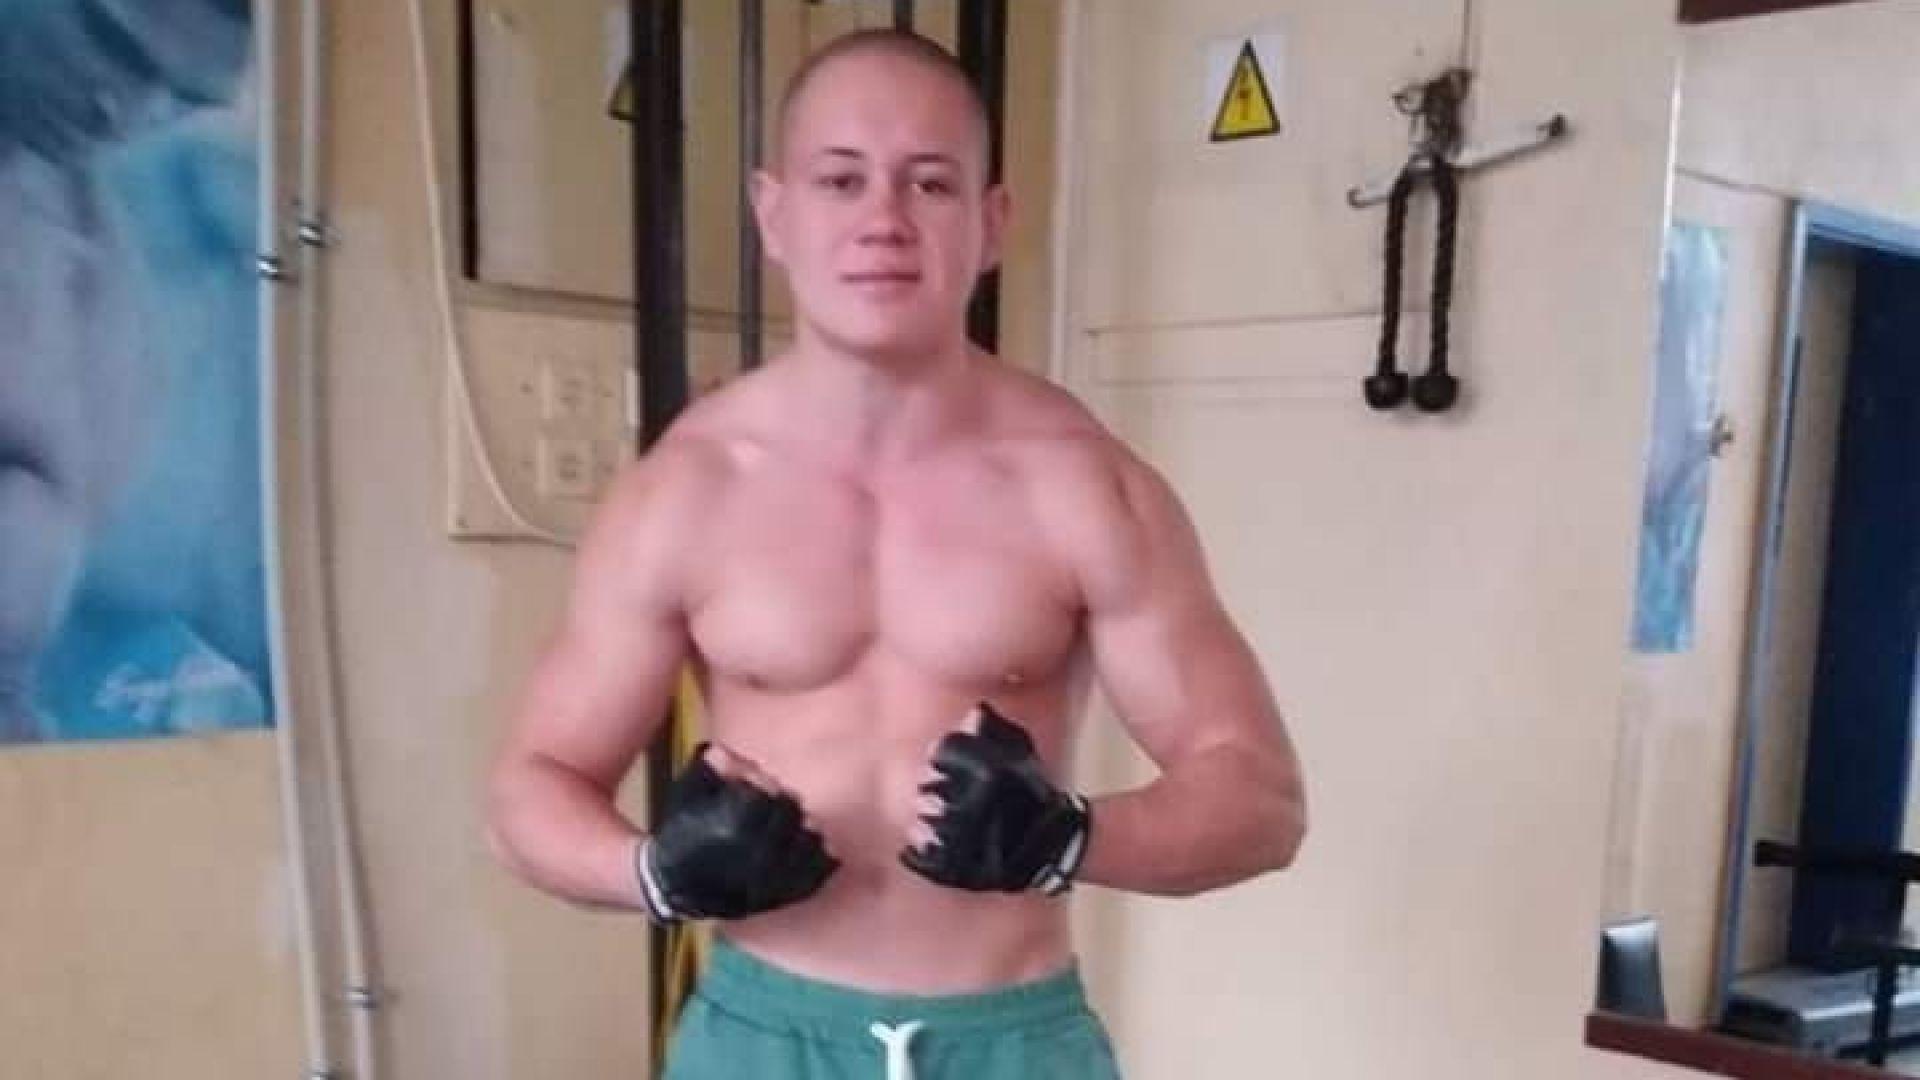 Окръжната прокуратура в Кюстендил повдигна обвинение срещу 19-годишния Алекс Иванов